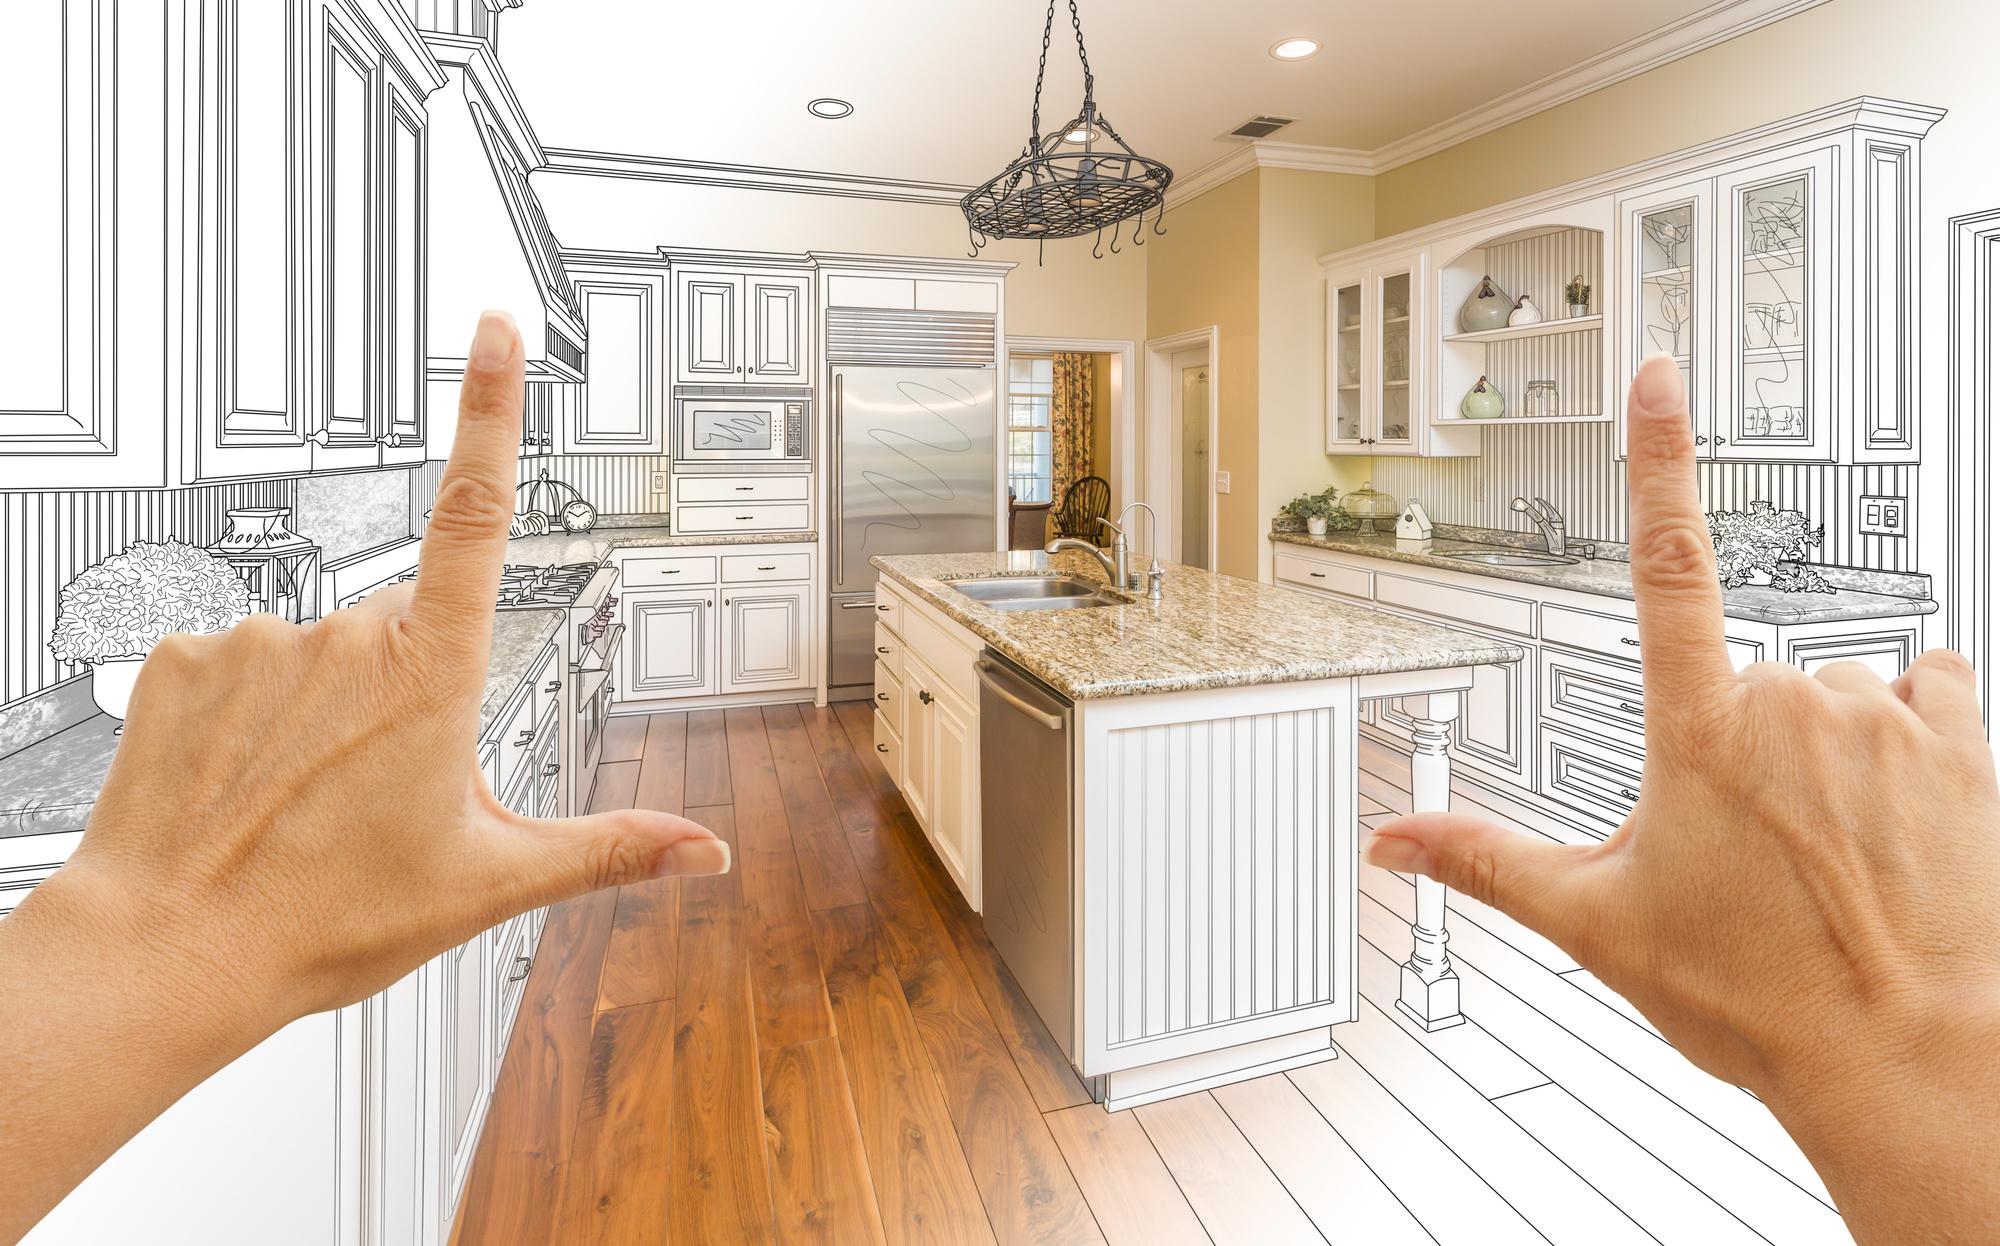 Kitchen Remodeling Concept